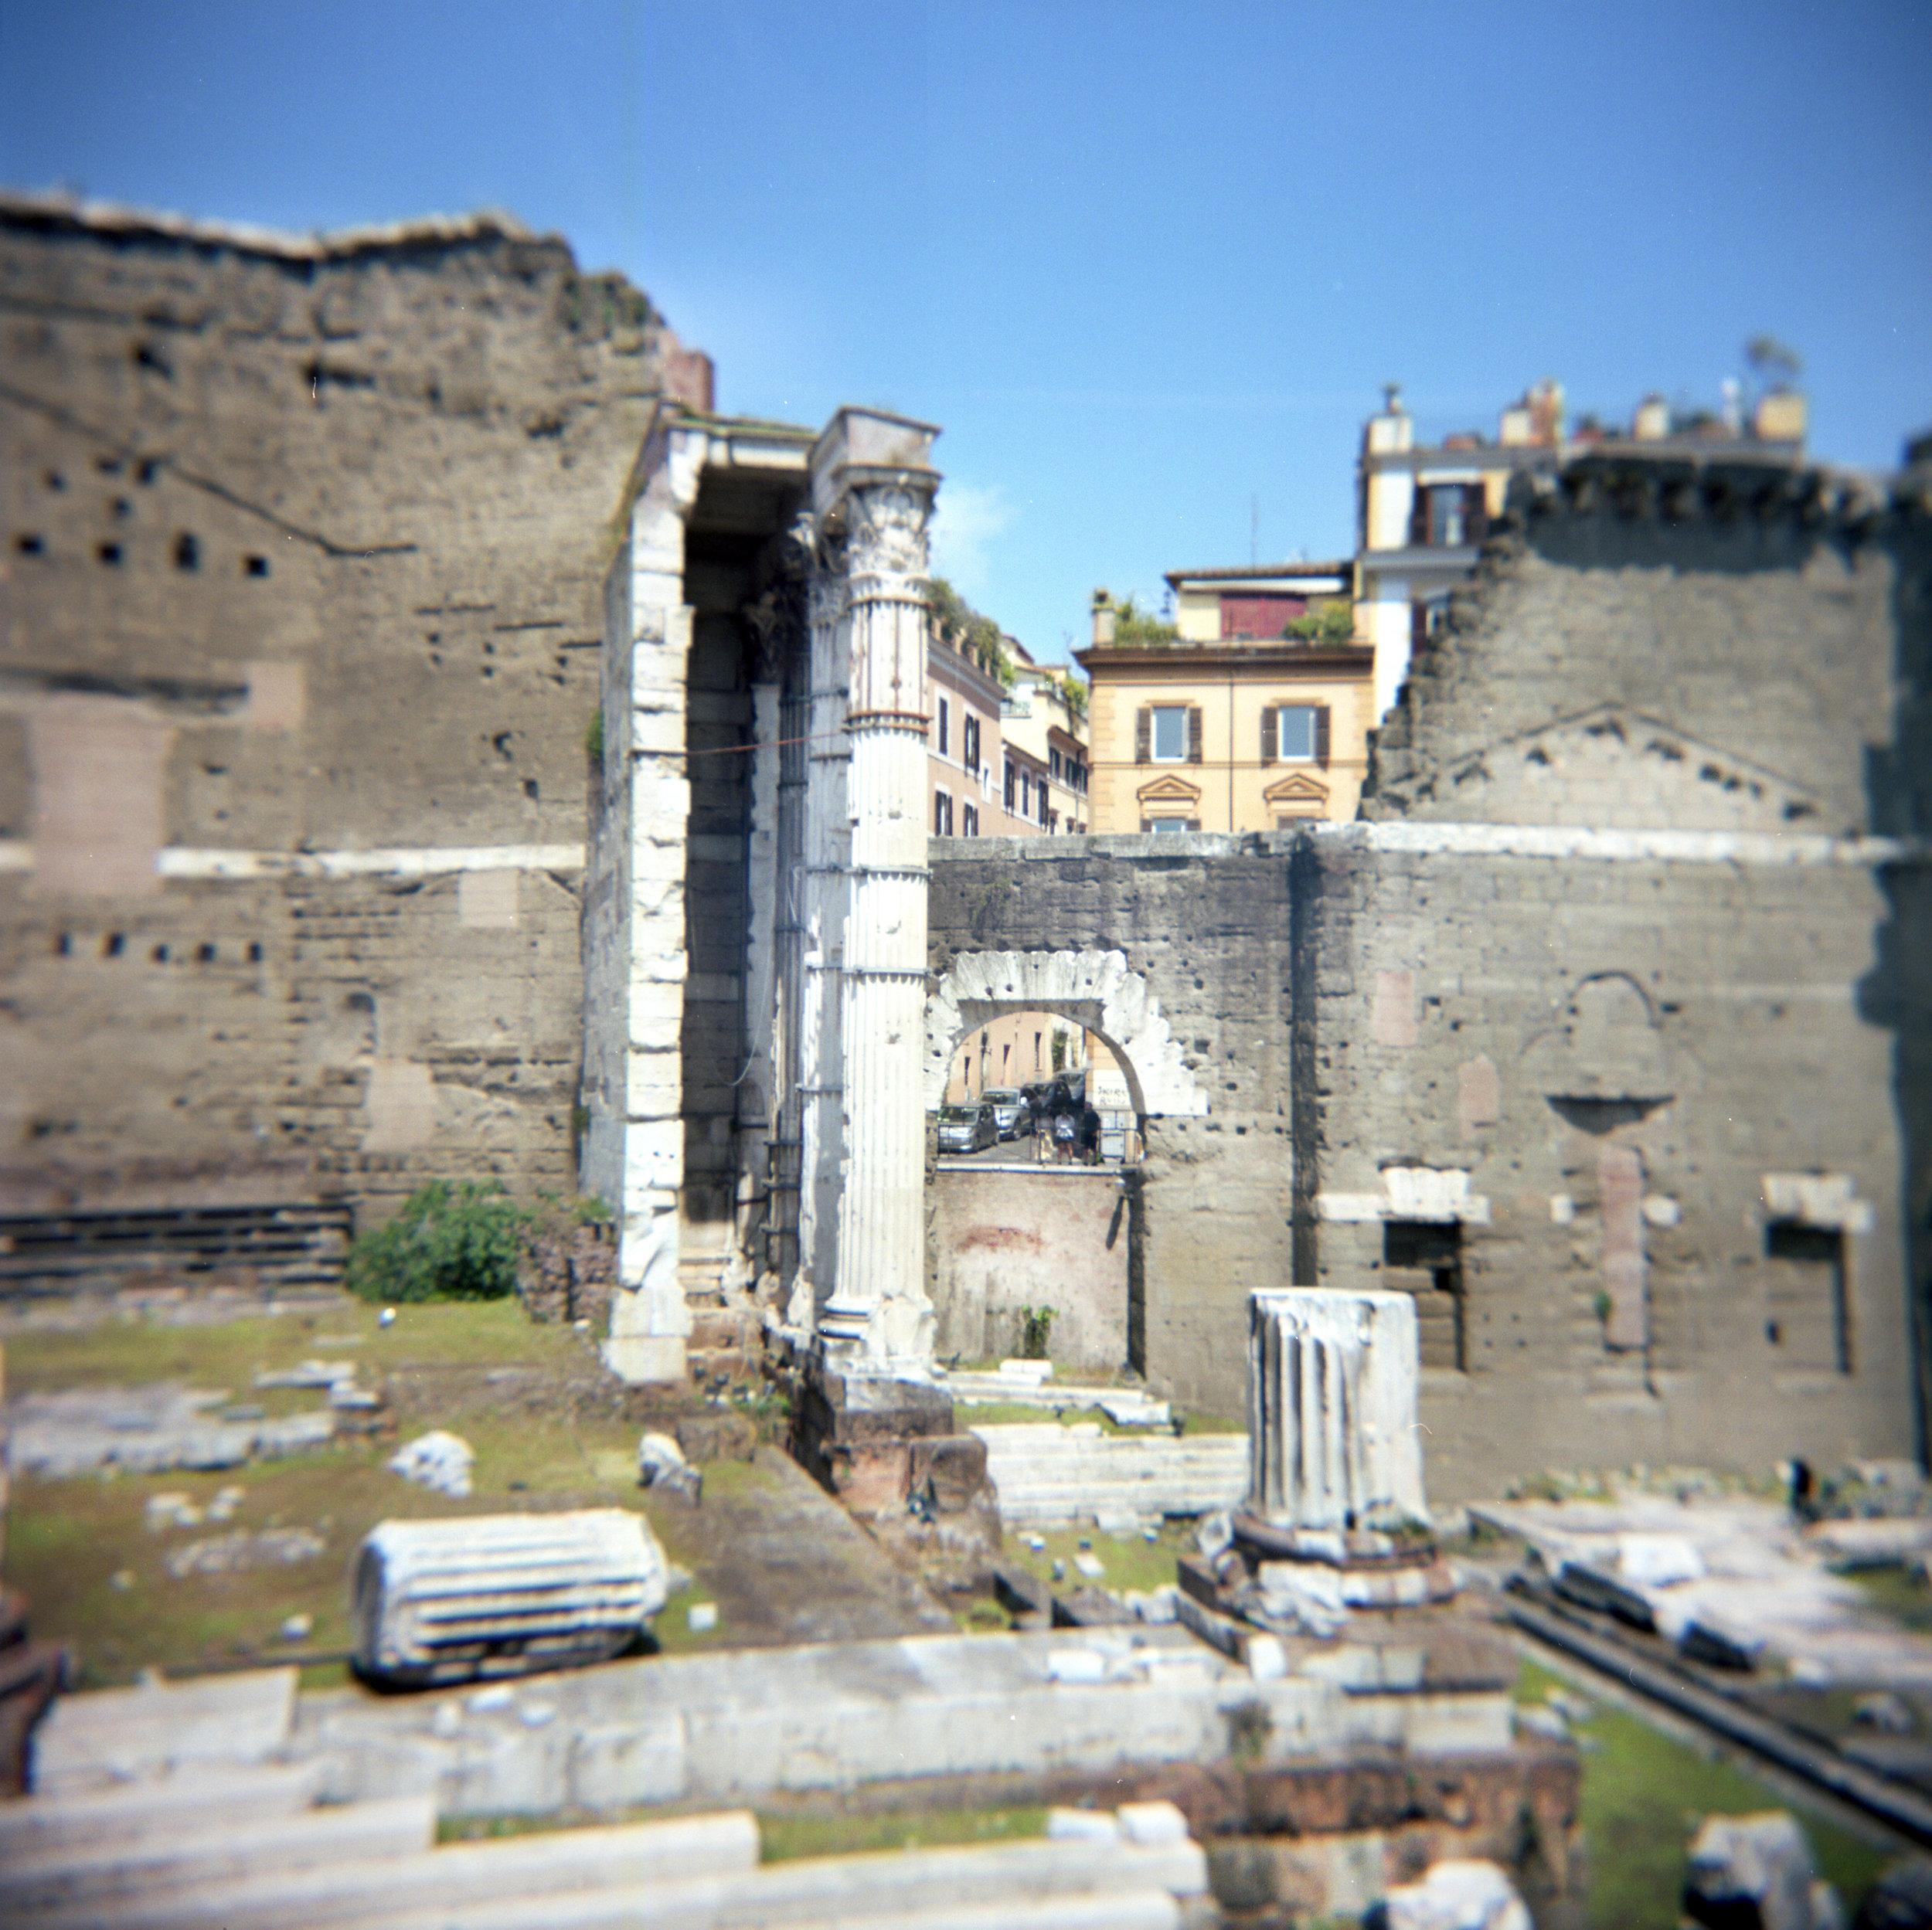 Italy072.jpg